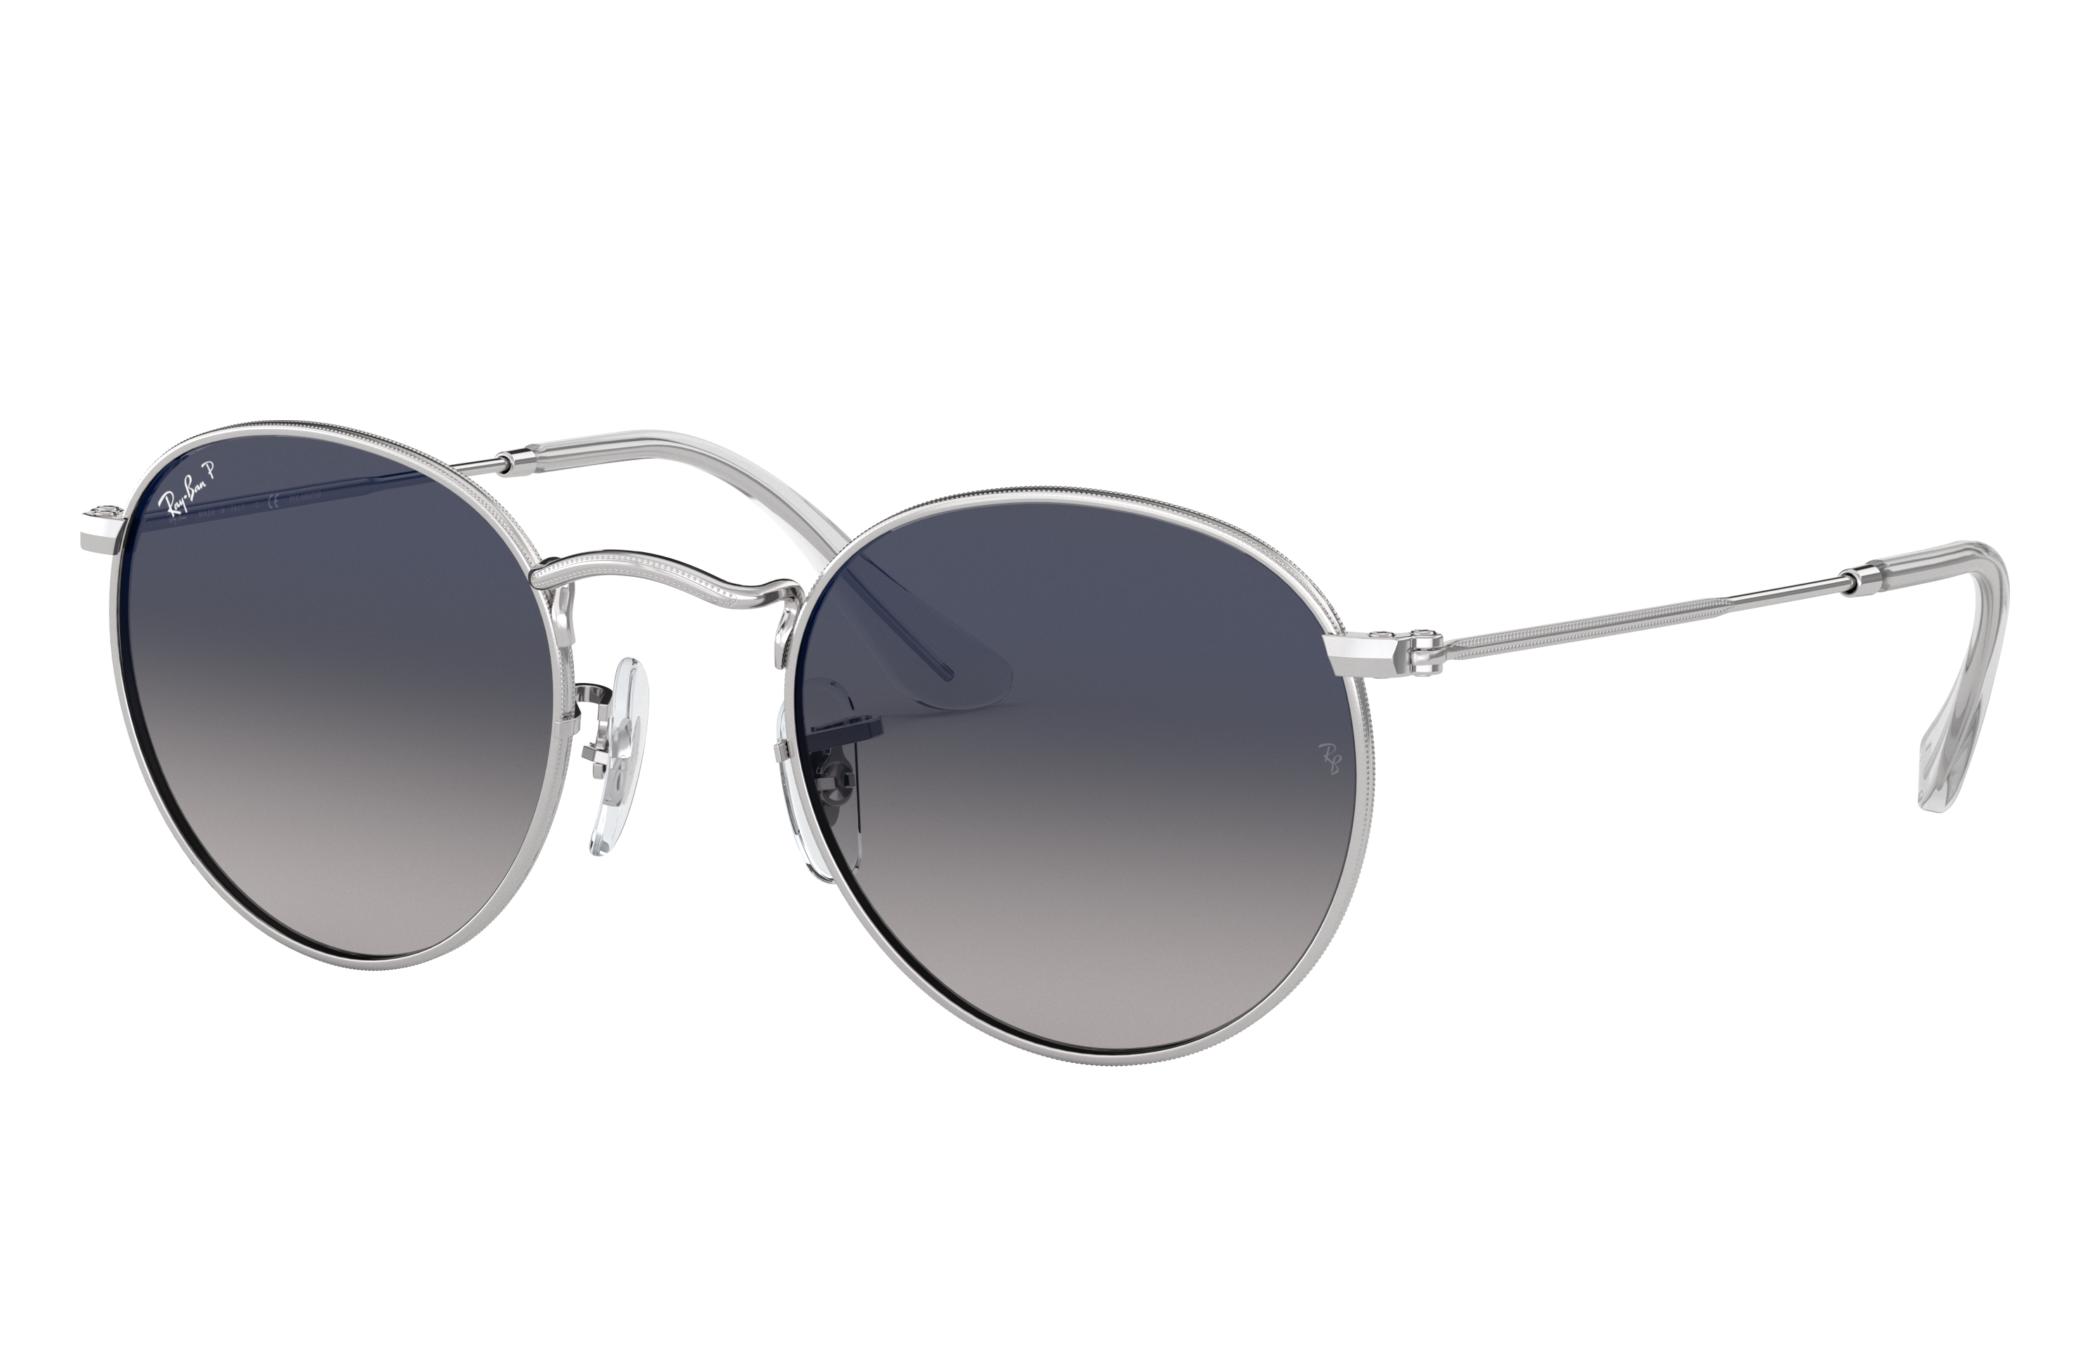 Ray-Ban Round Flat Lenses Silver, Polarized Blue Lenses - RB3447N